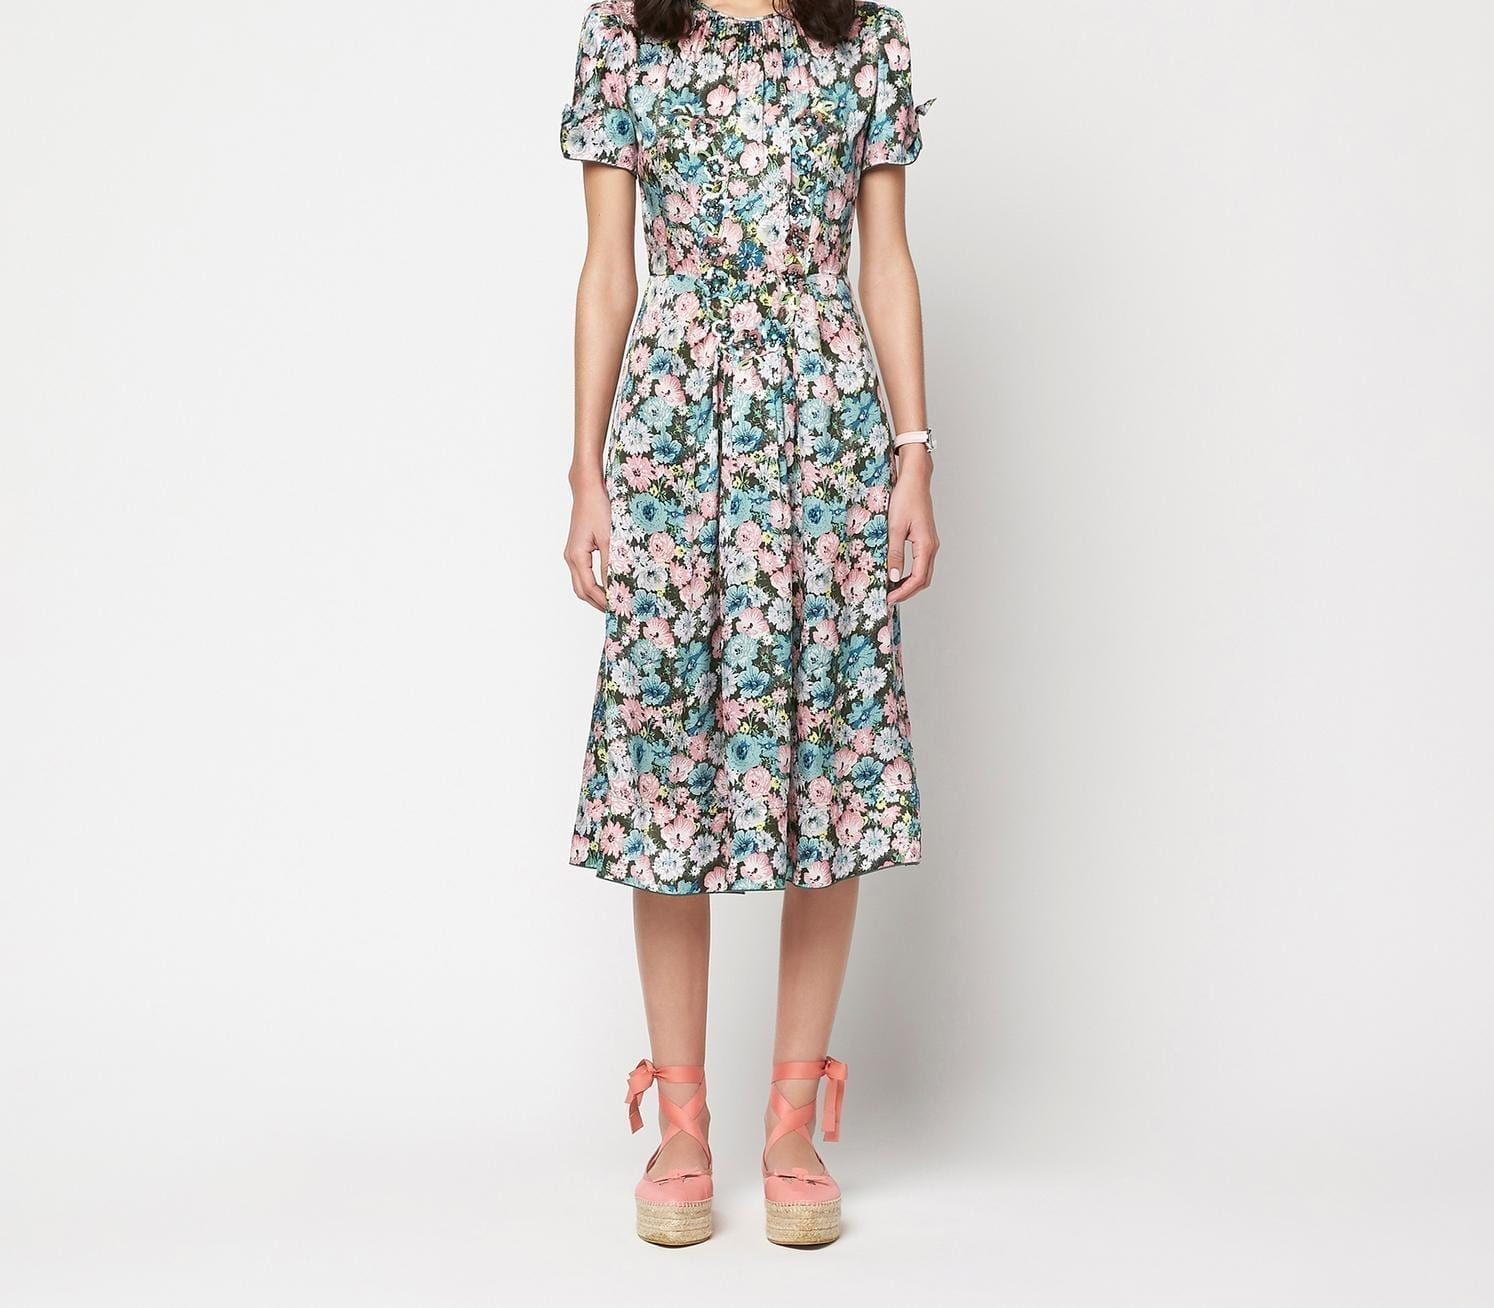 MARC JACOBS '40S Dress